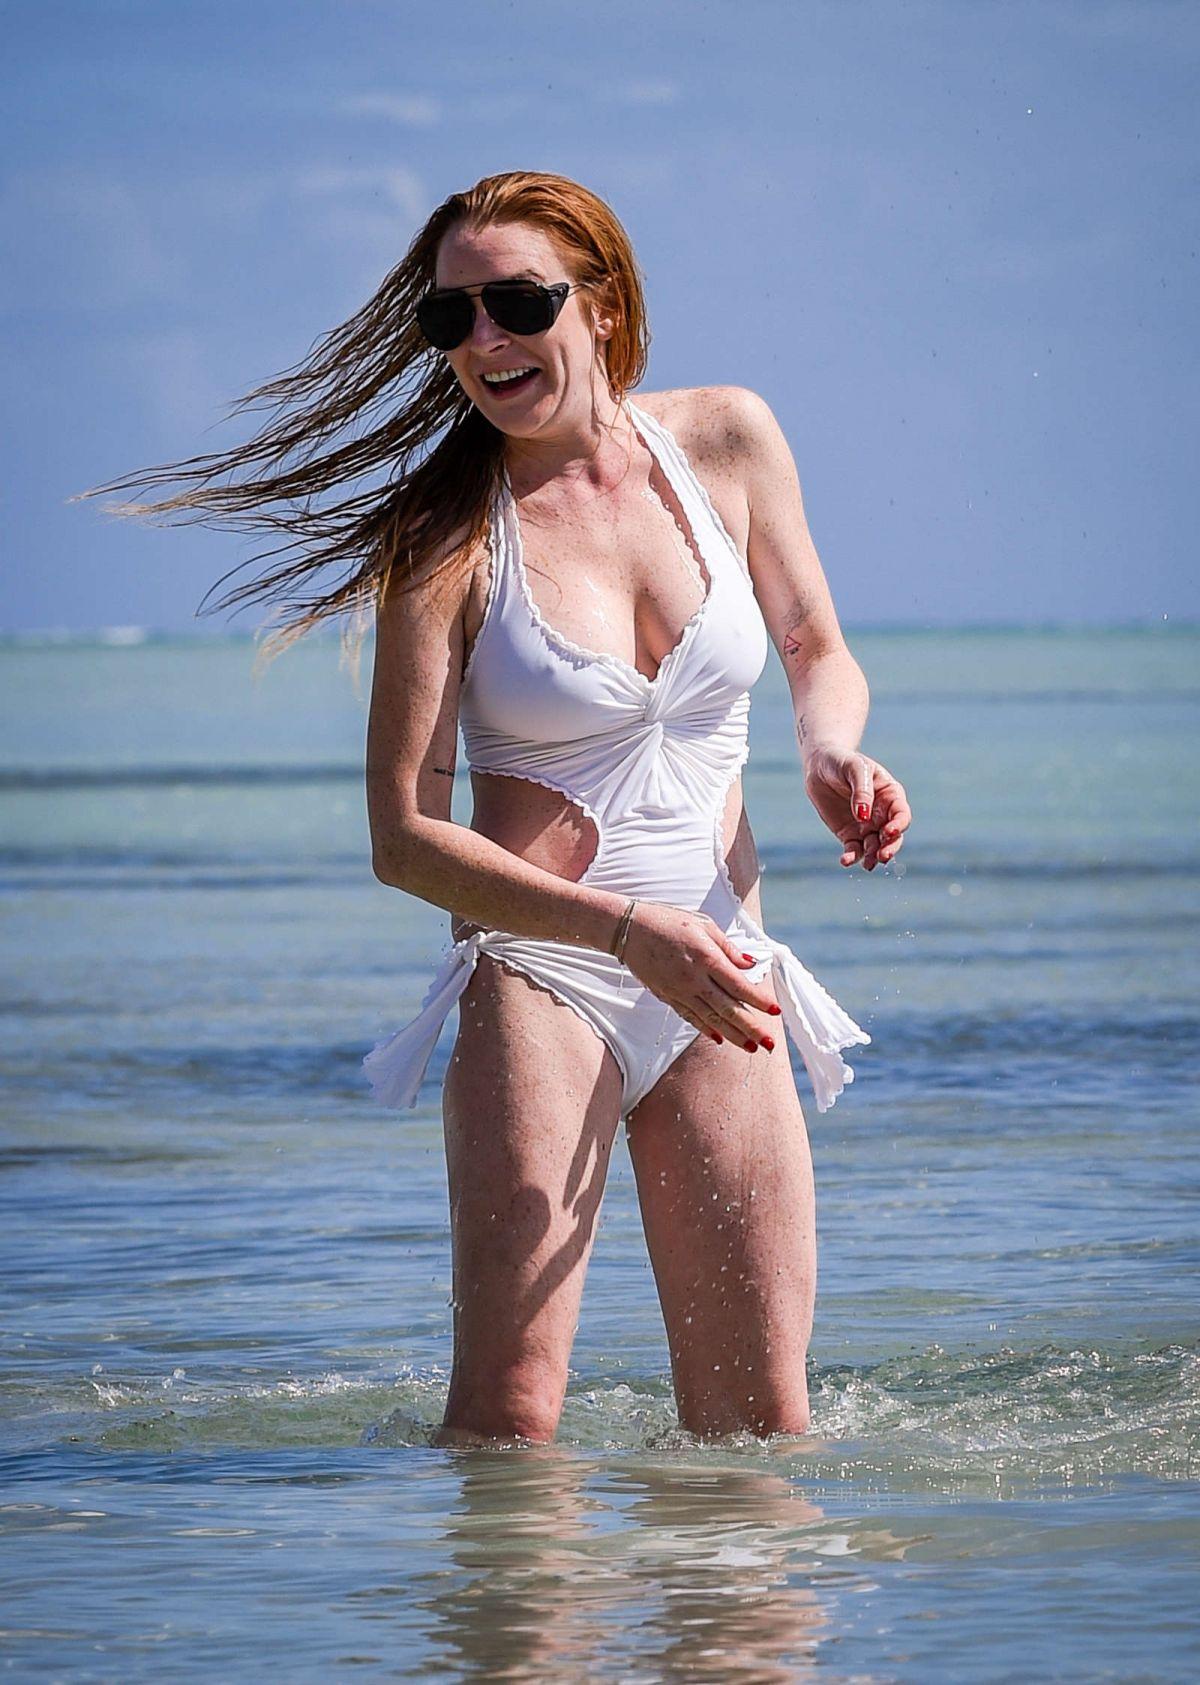 saskia howard clark topless